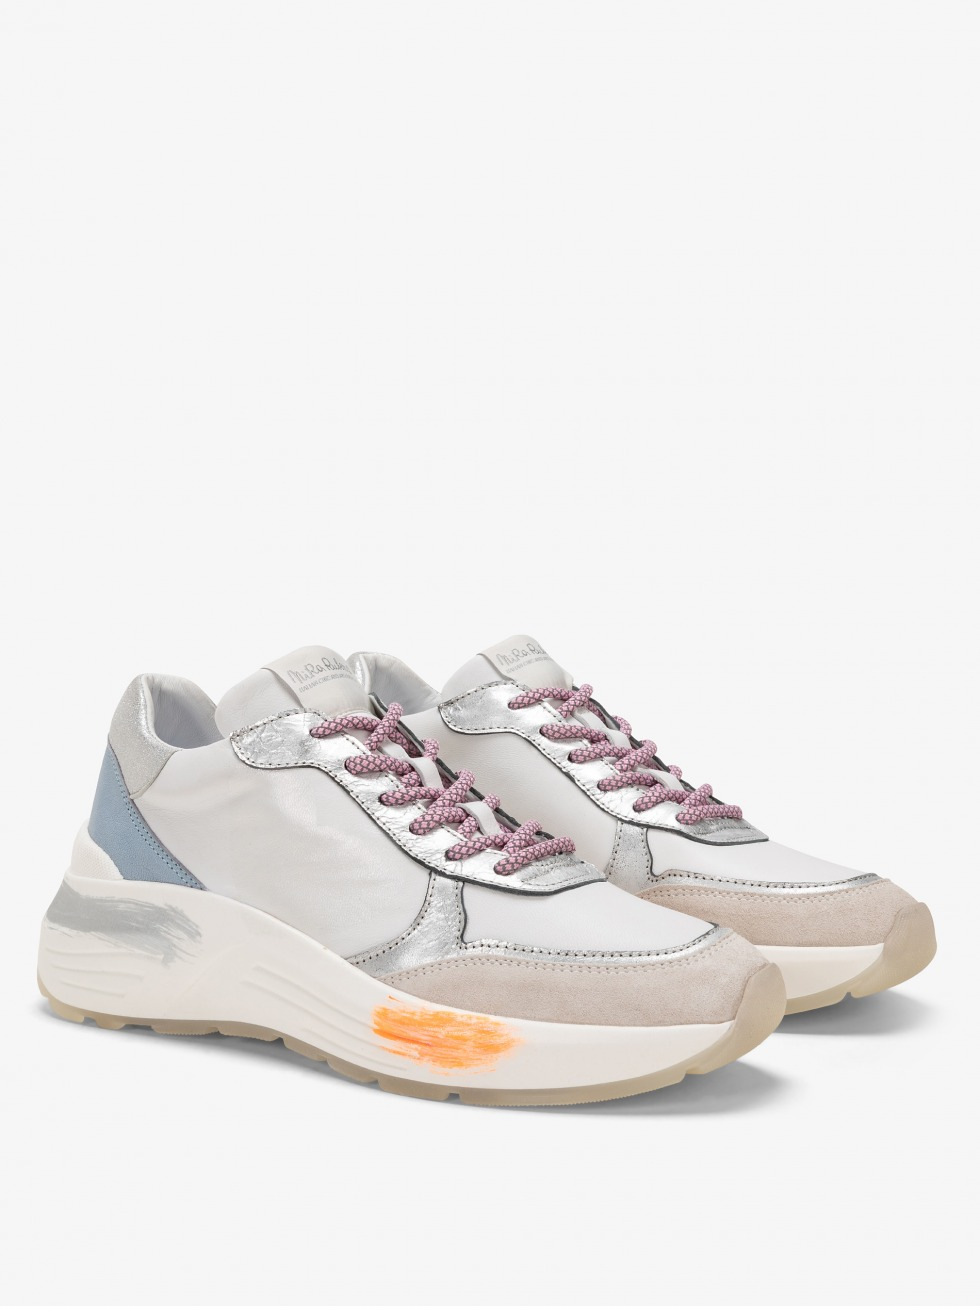 Stinger Chunky Sneakers Paradise - Heart